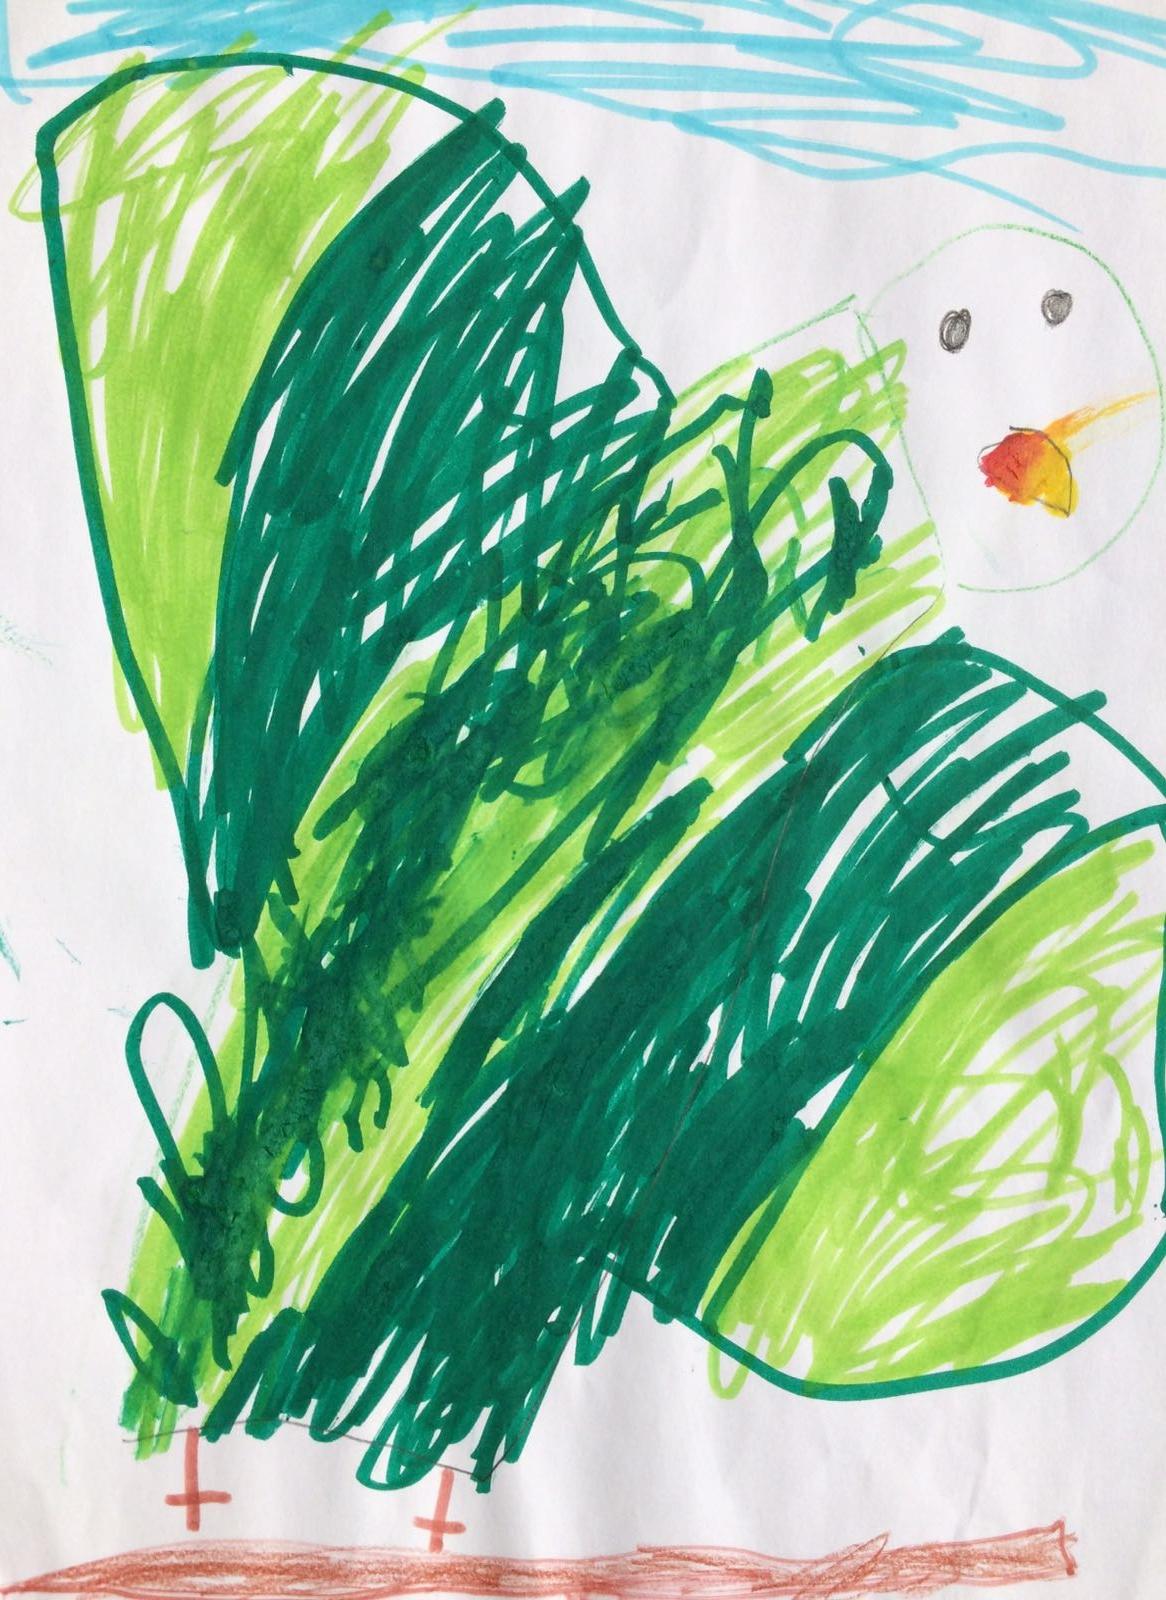 A Green Parrot, by Oscar